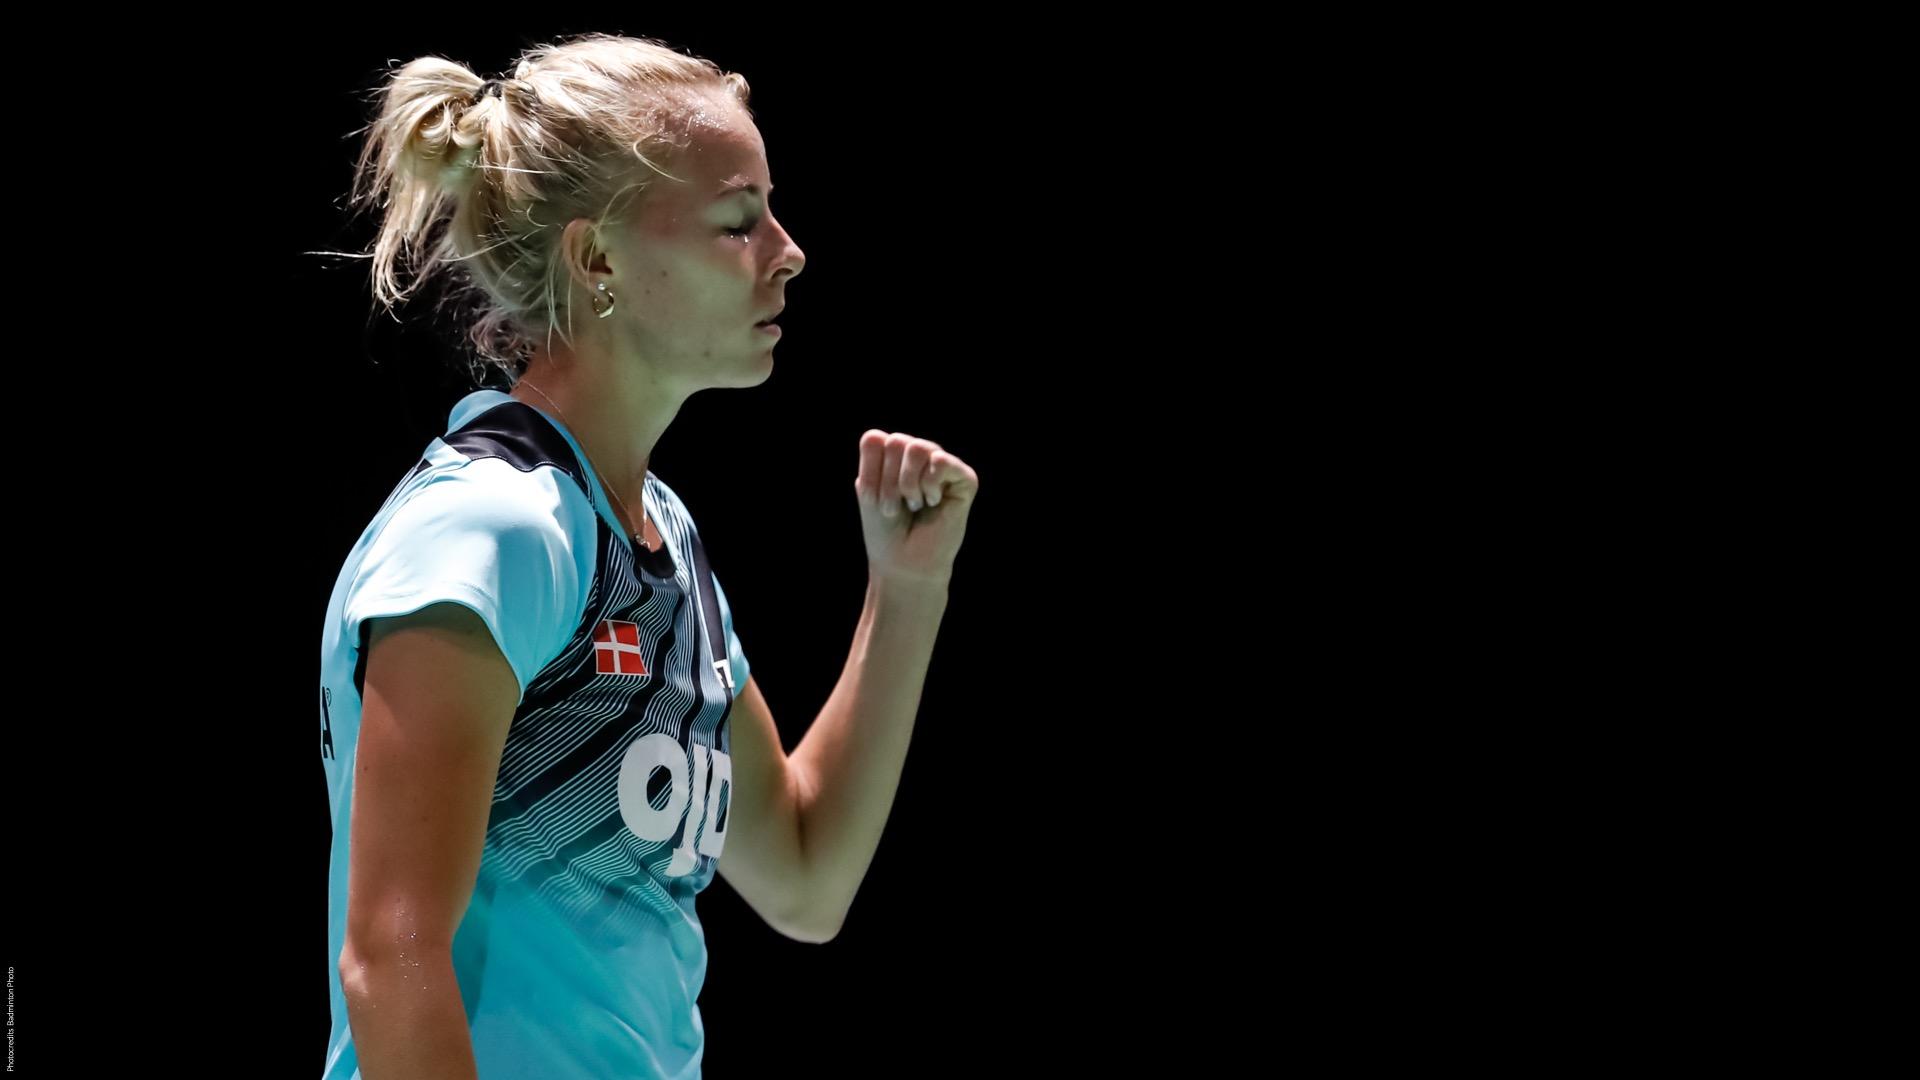 Photo credits: Badminton Photo